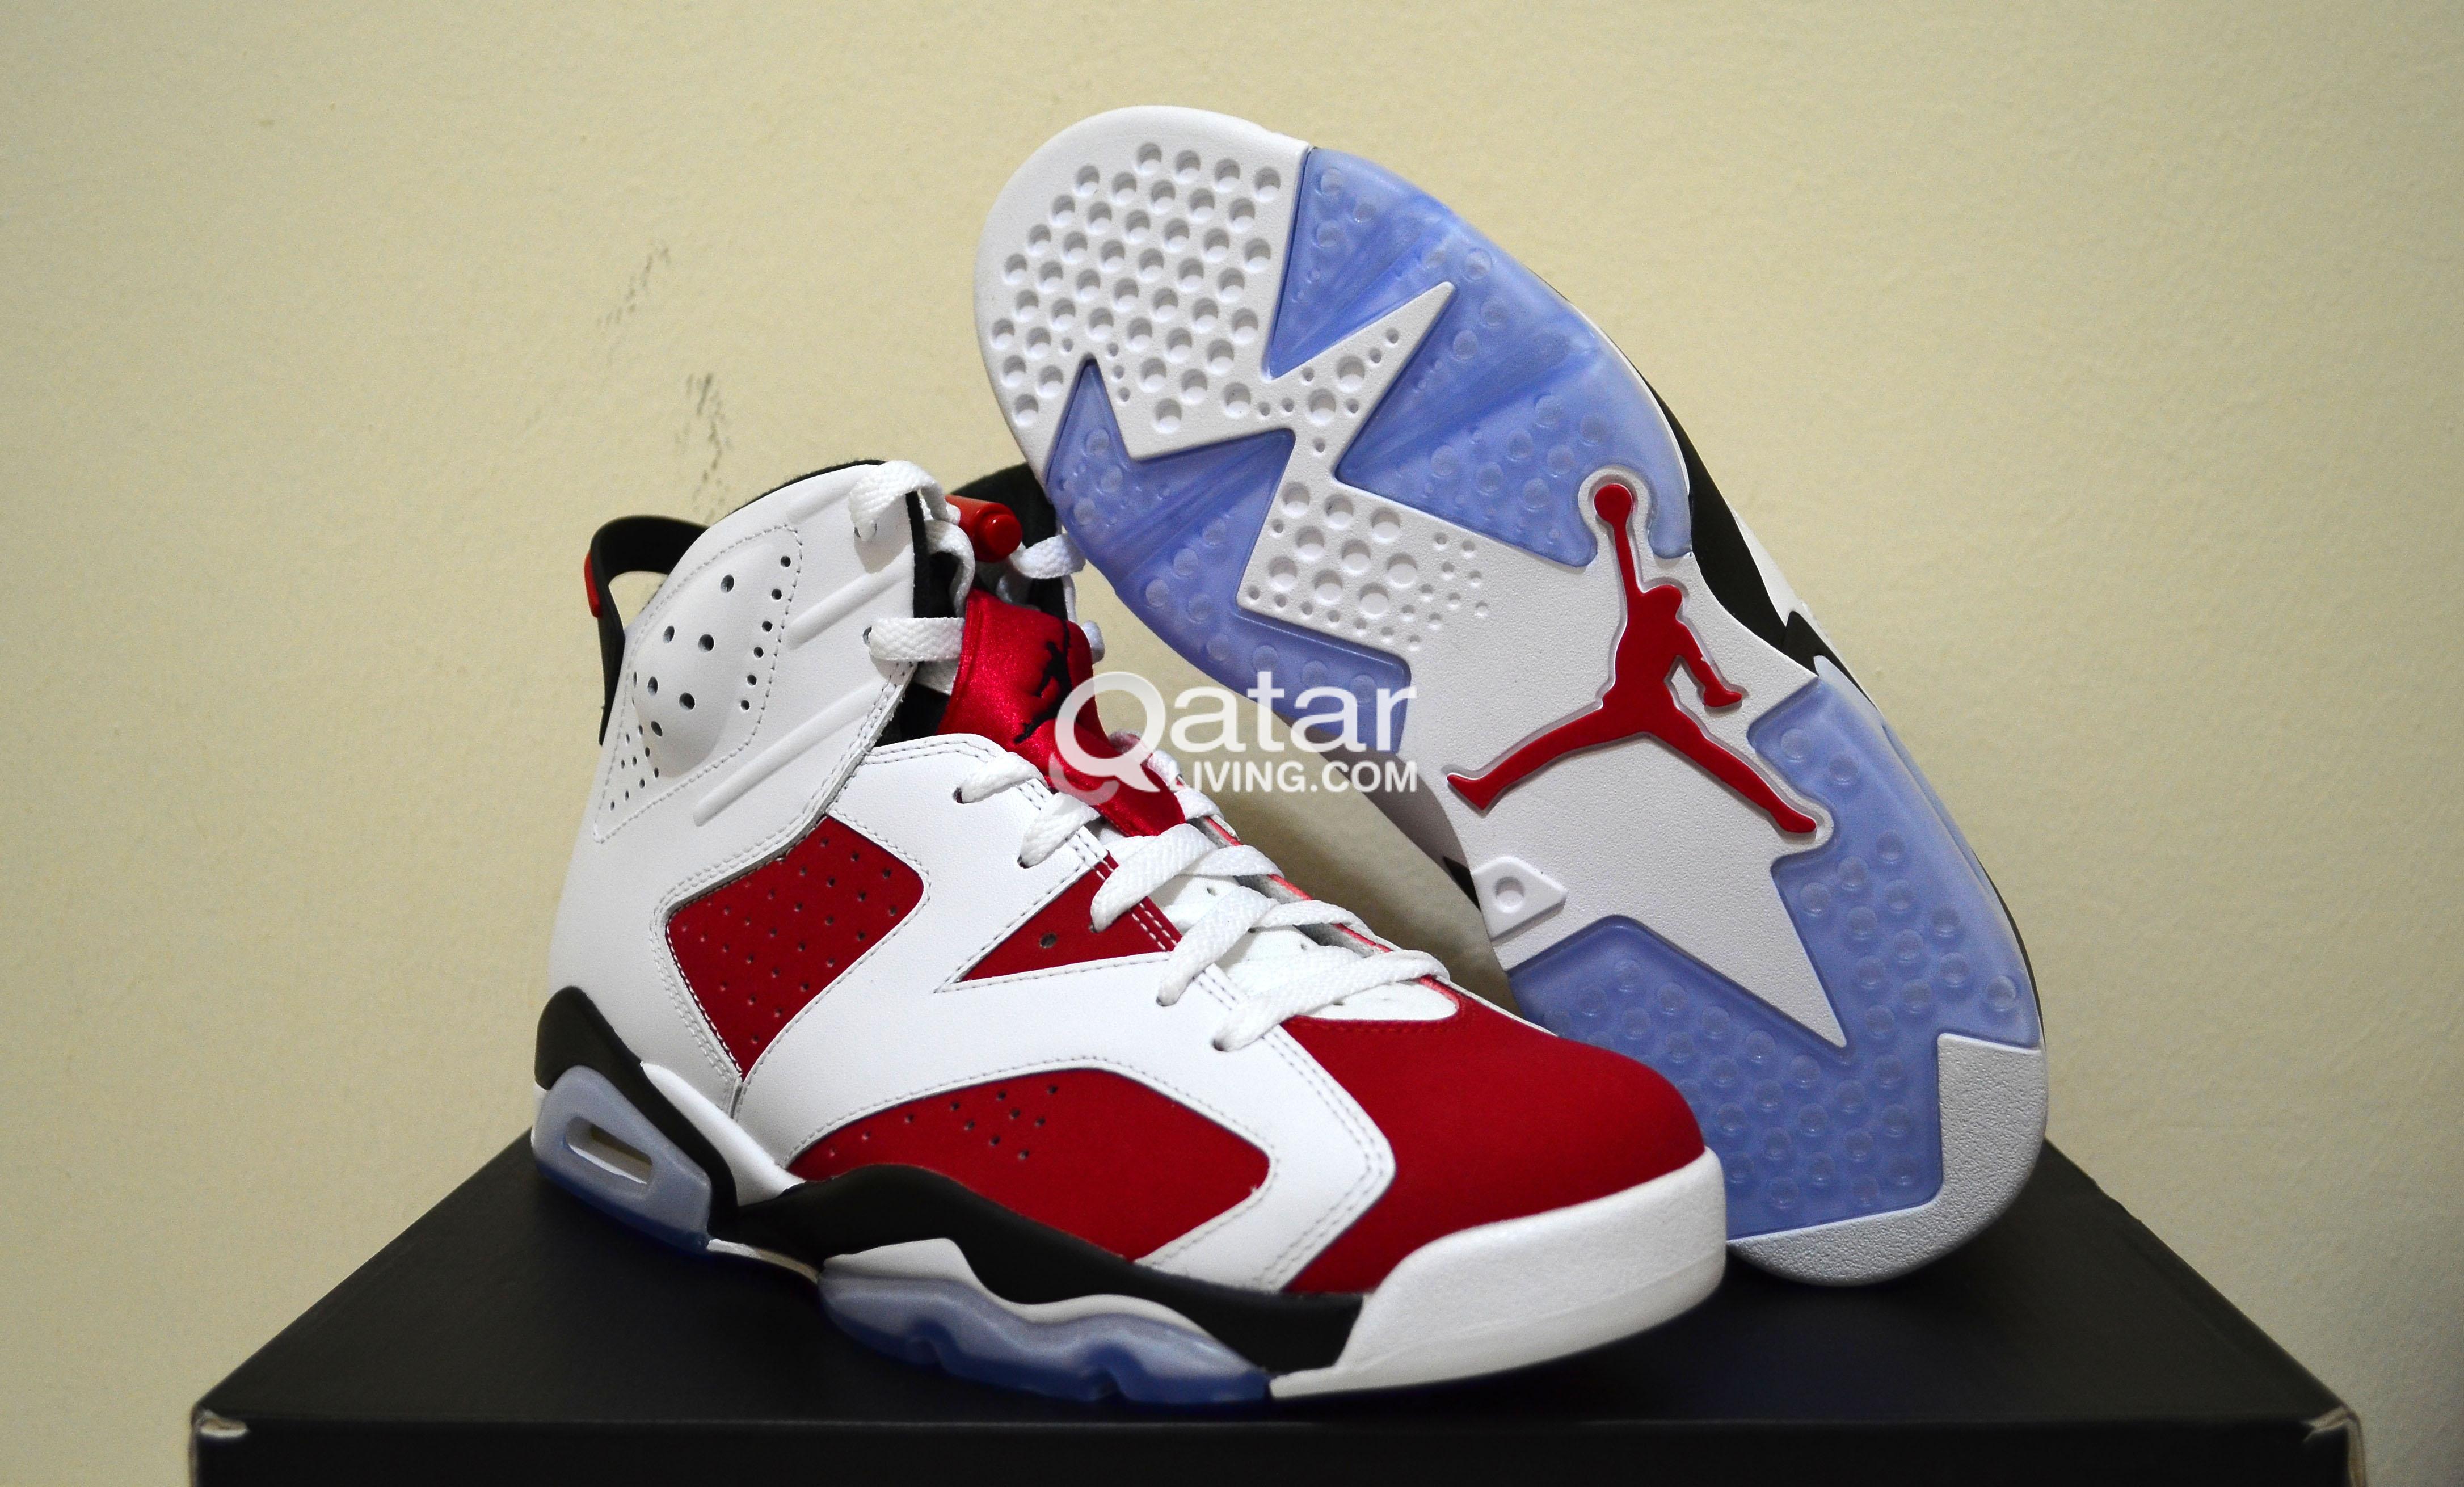 3338064c2ea8 title · title · title · title · title · title. Information. For Immediate  Sale  Jordan Retro 6 Carmine